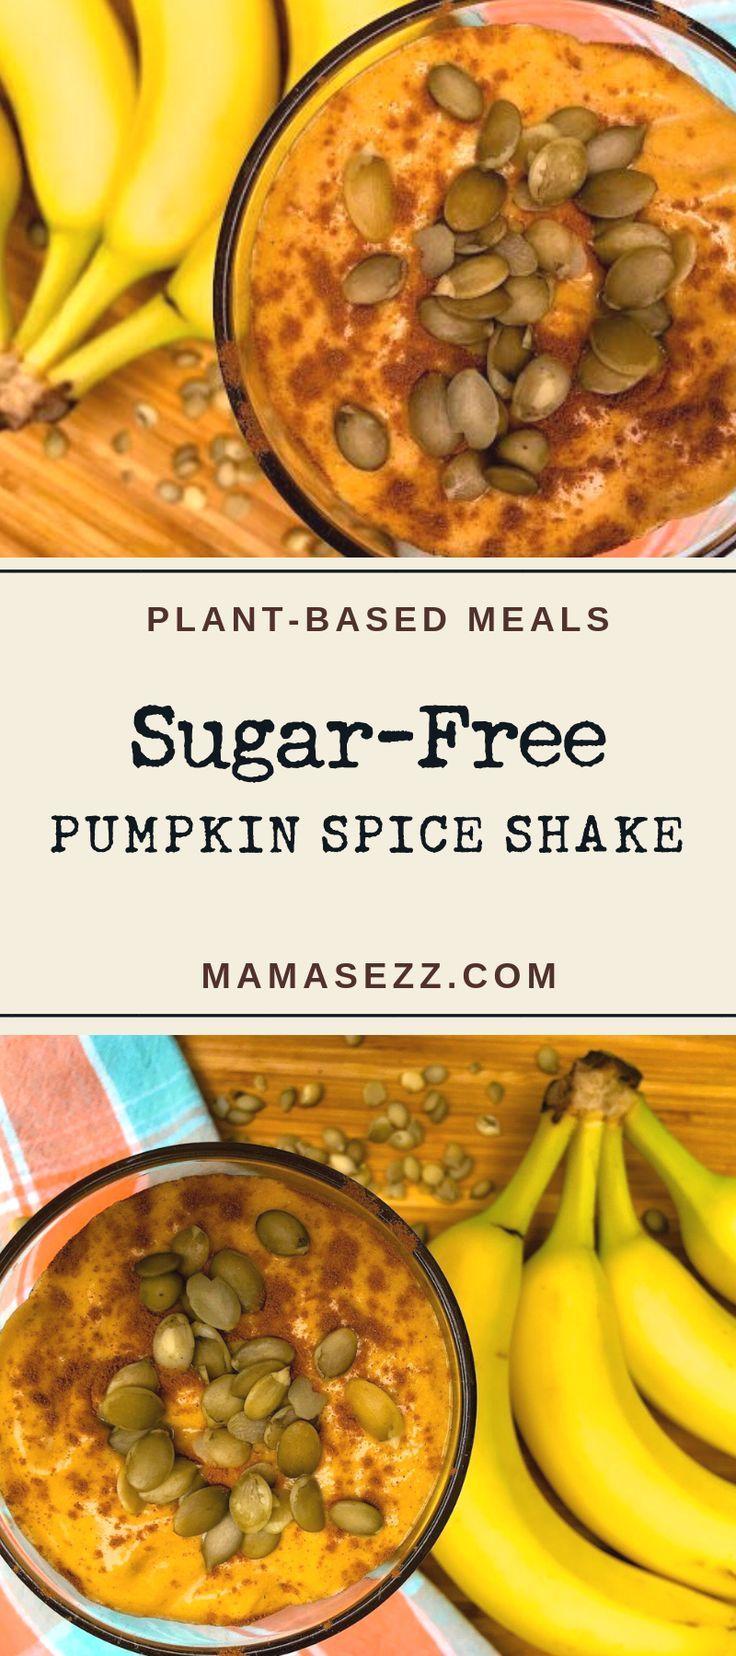 Refined Sugar Free Pumpkin Spice Shake